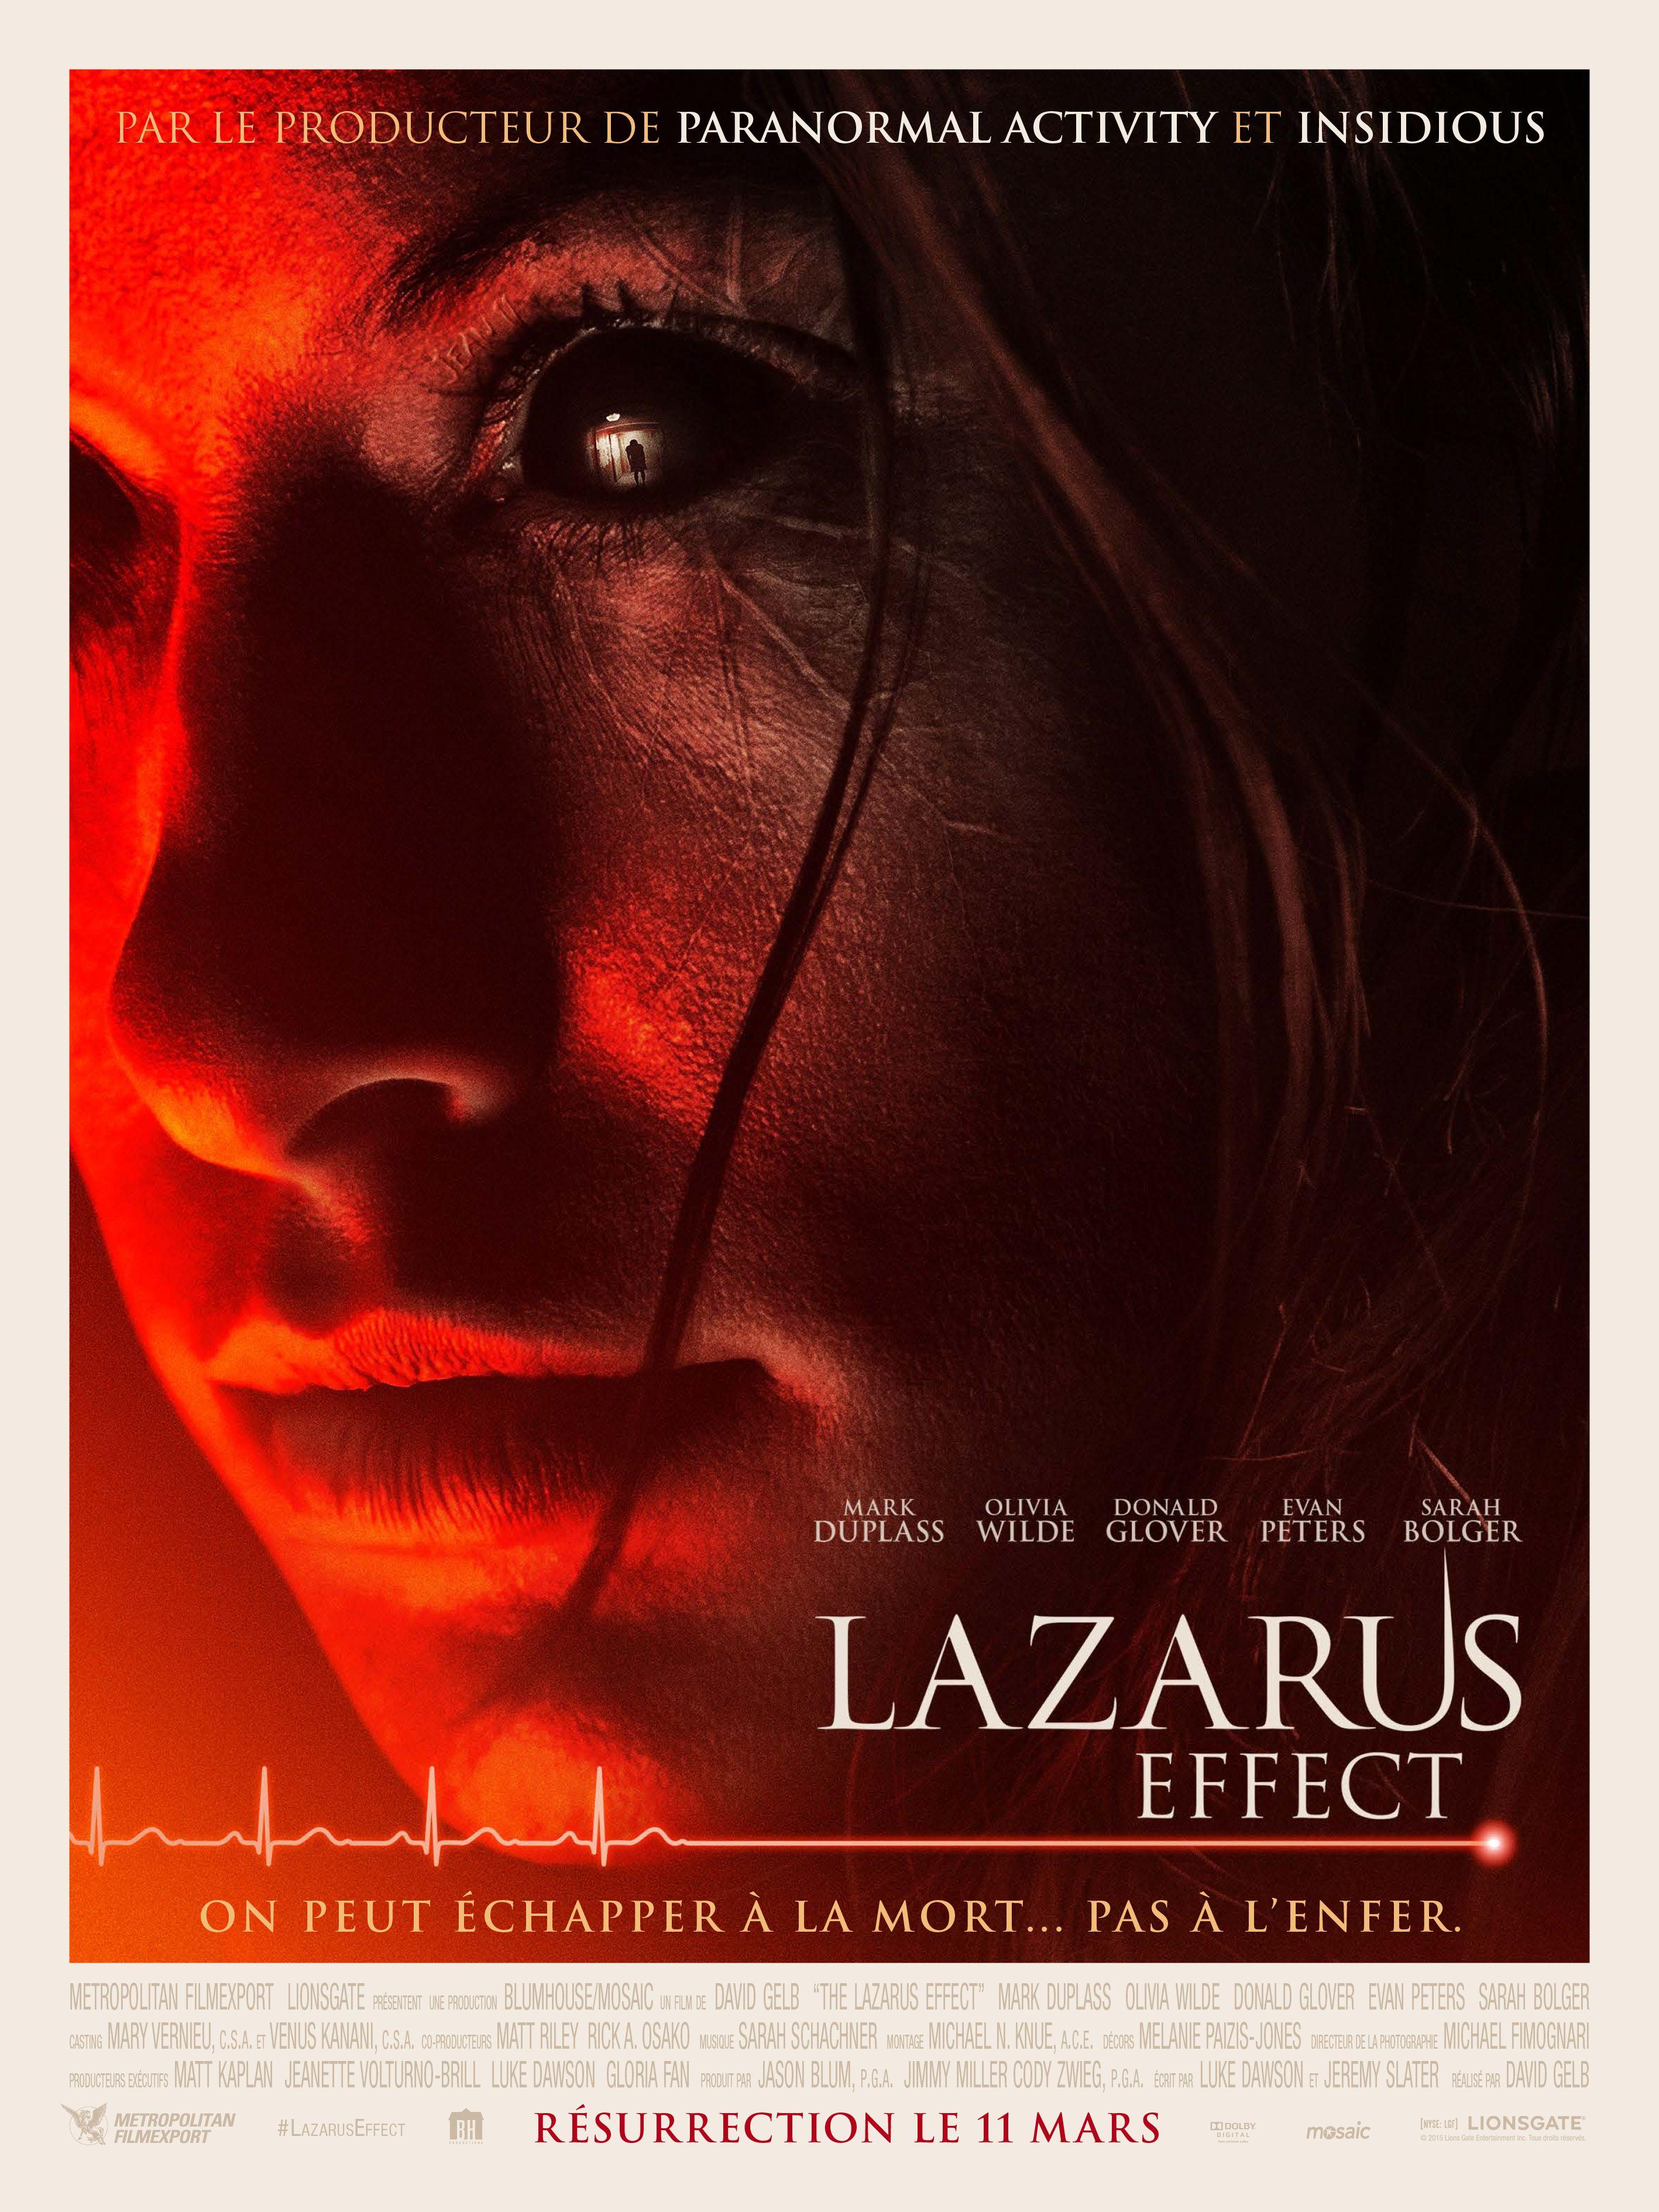 Lazarus Effect - Film (2015)